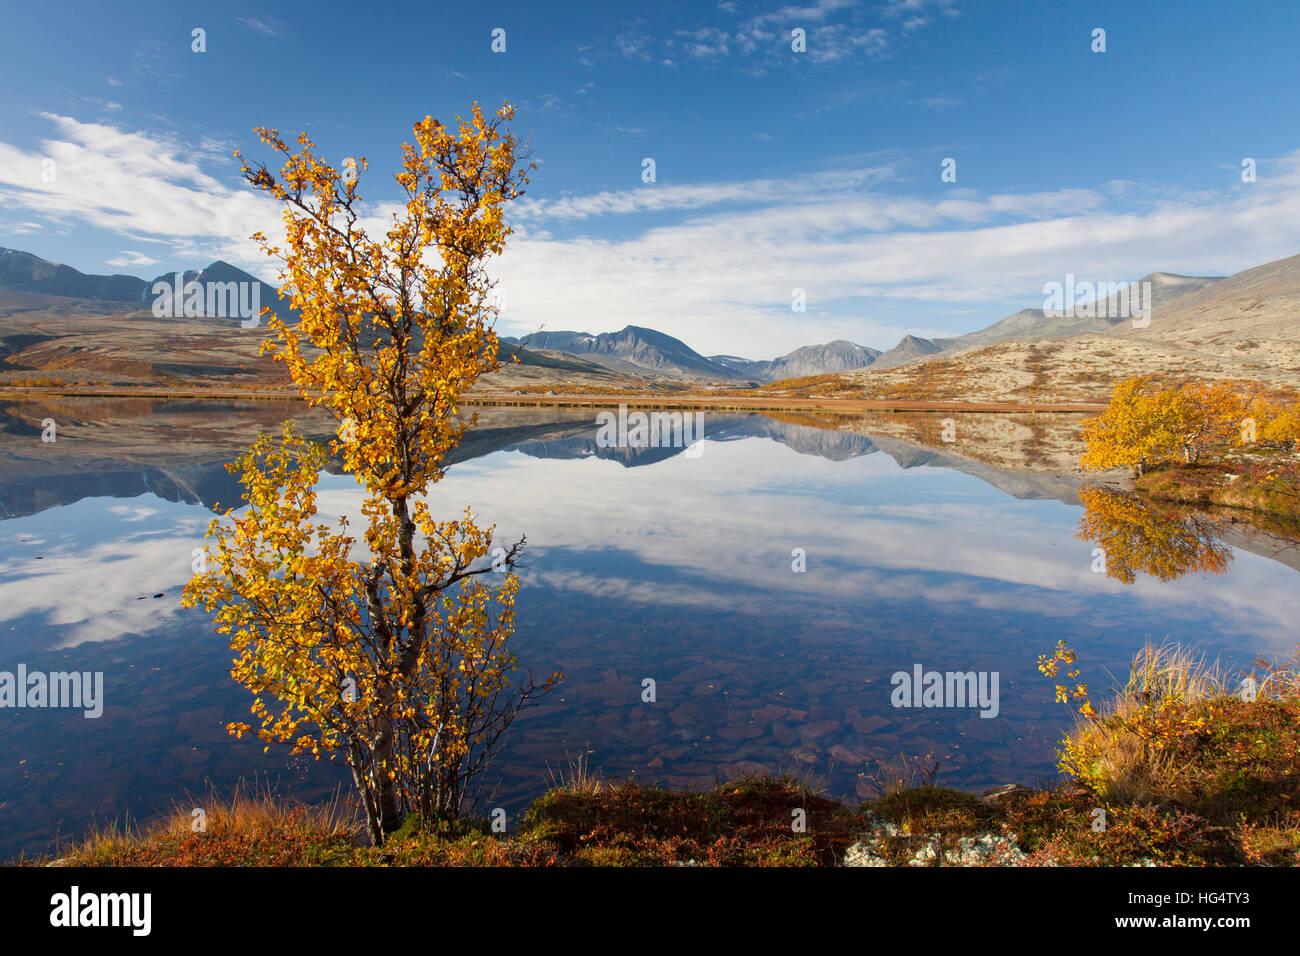 Birch trees showing autumn colours along lake, Døråldalen in Rondane National Park, Oppland, Norway - Stock Image